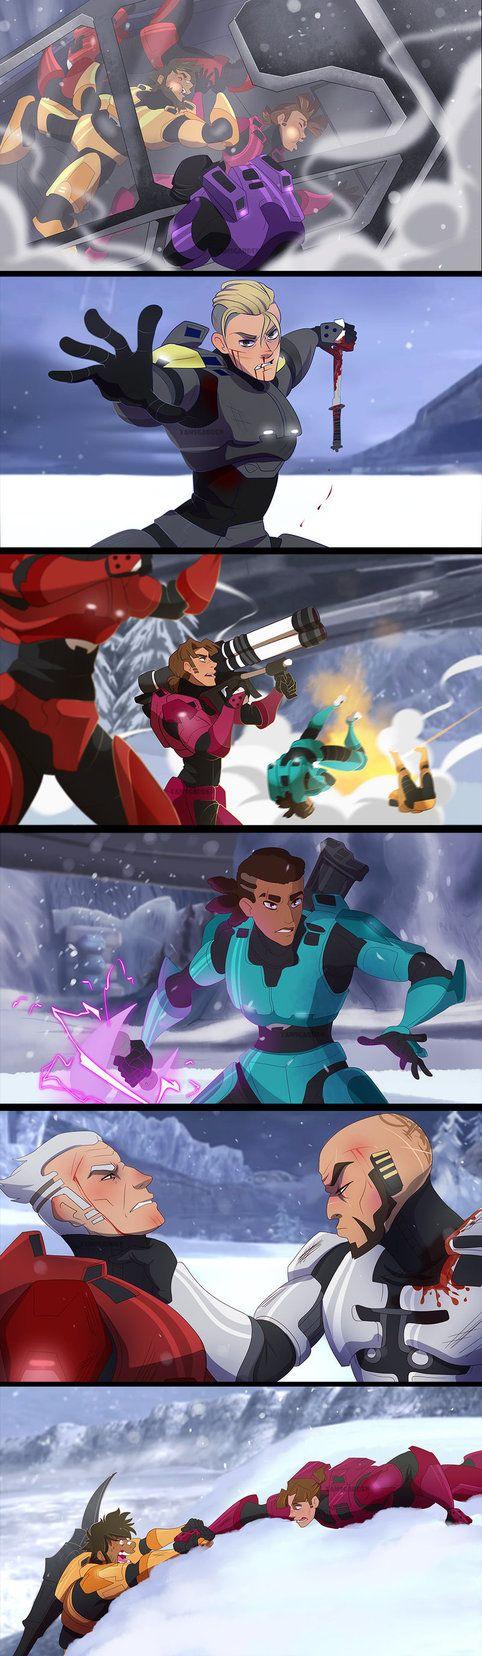 Red VS Blue - Screenshots Redraws 2 by YAMsgarden on DeviantArt